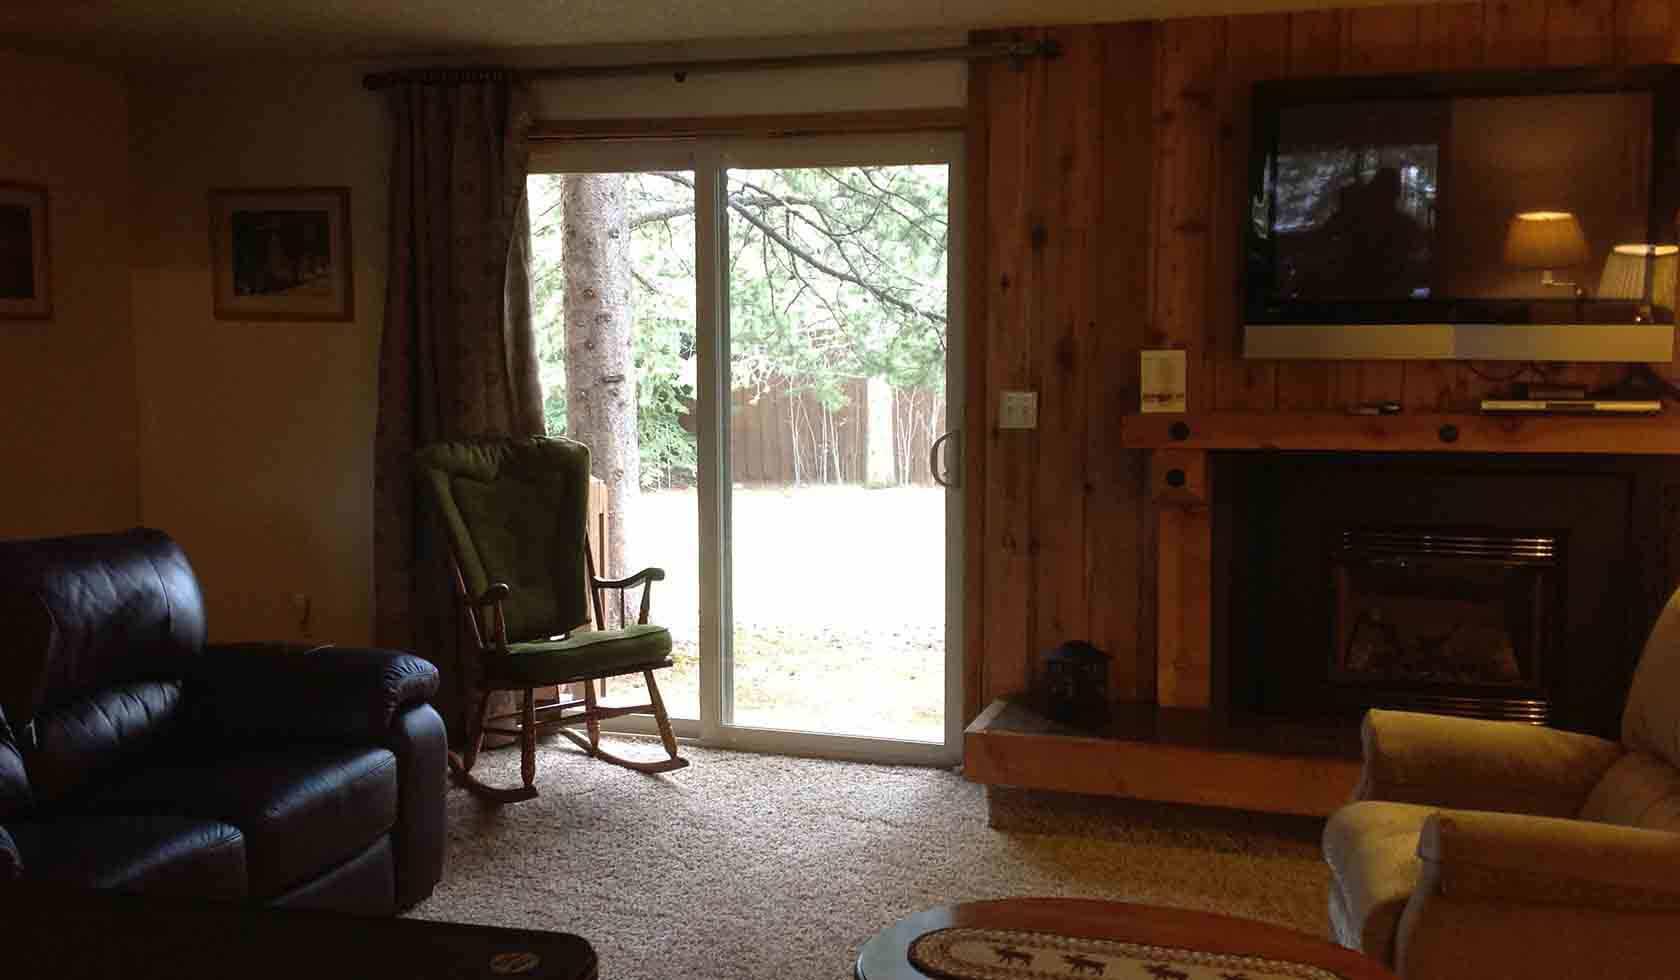 4 Seasons Yellowstone Townhouse Rental profile image